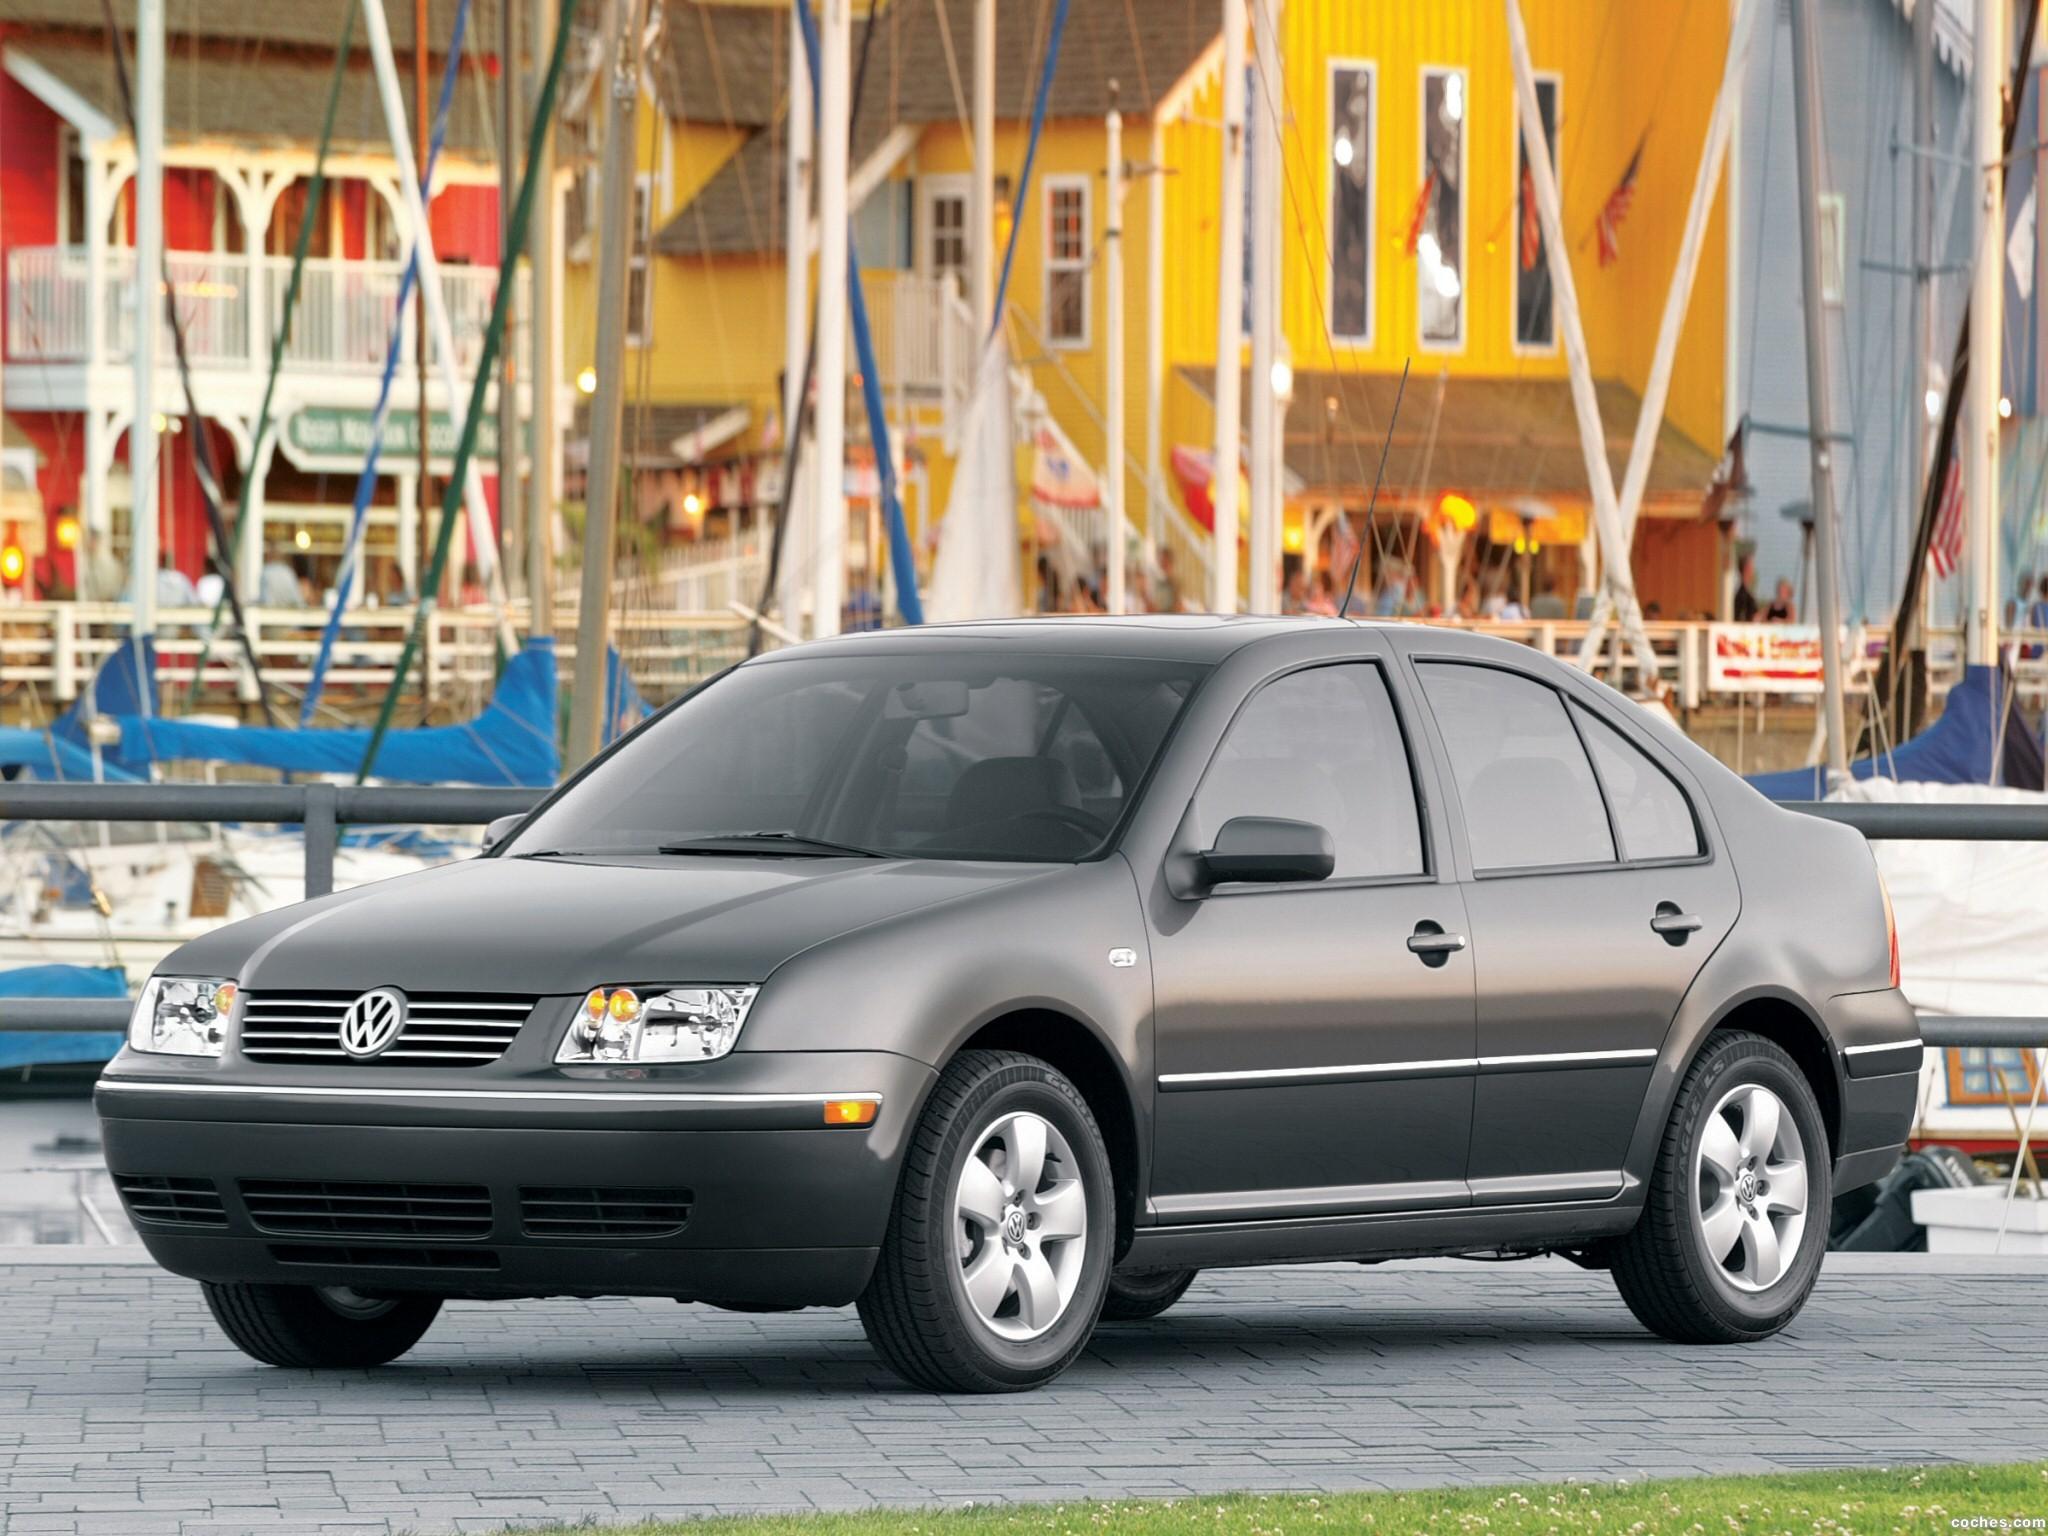 Foto 0 de Volkswagen Jetta GL USA 2005